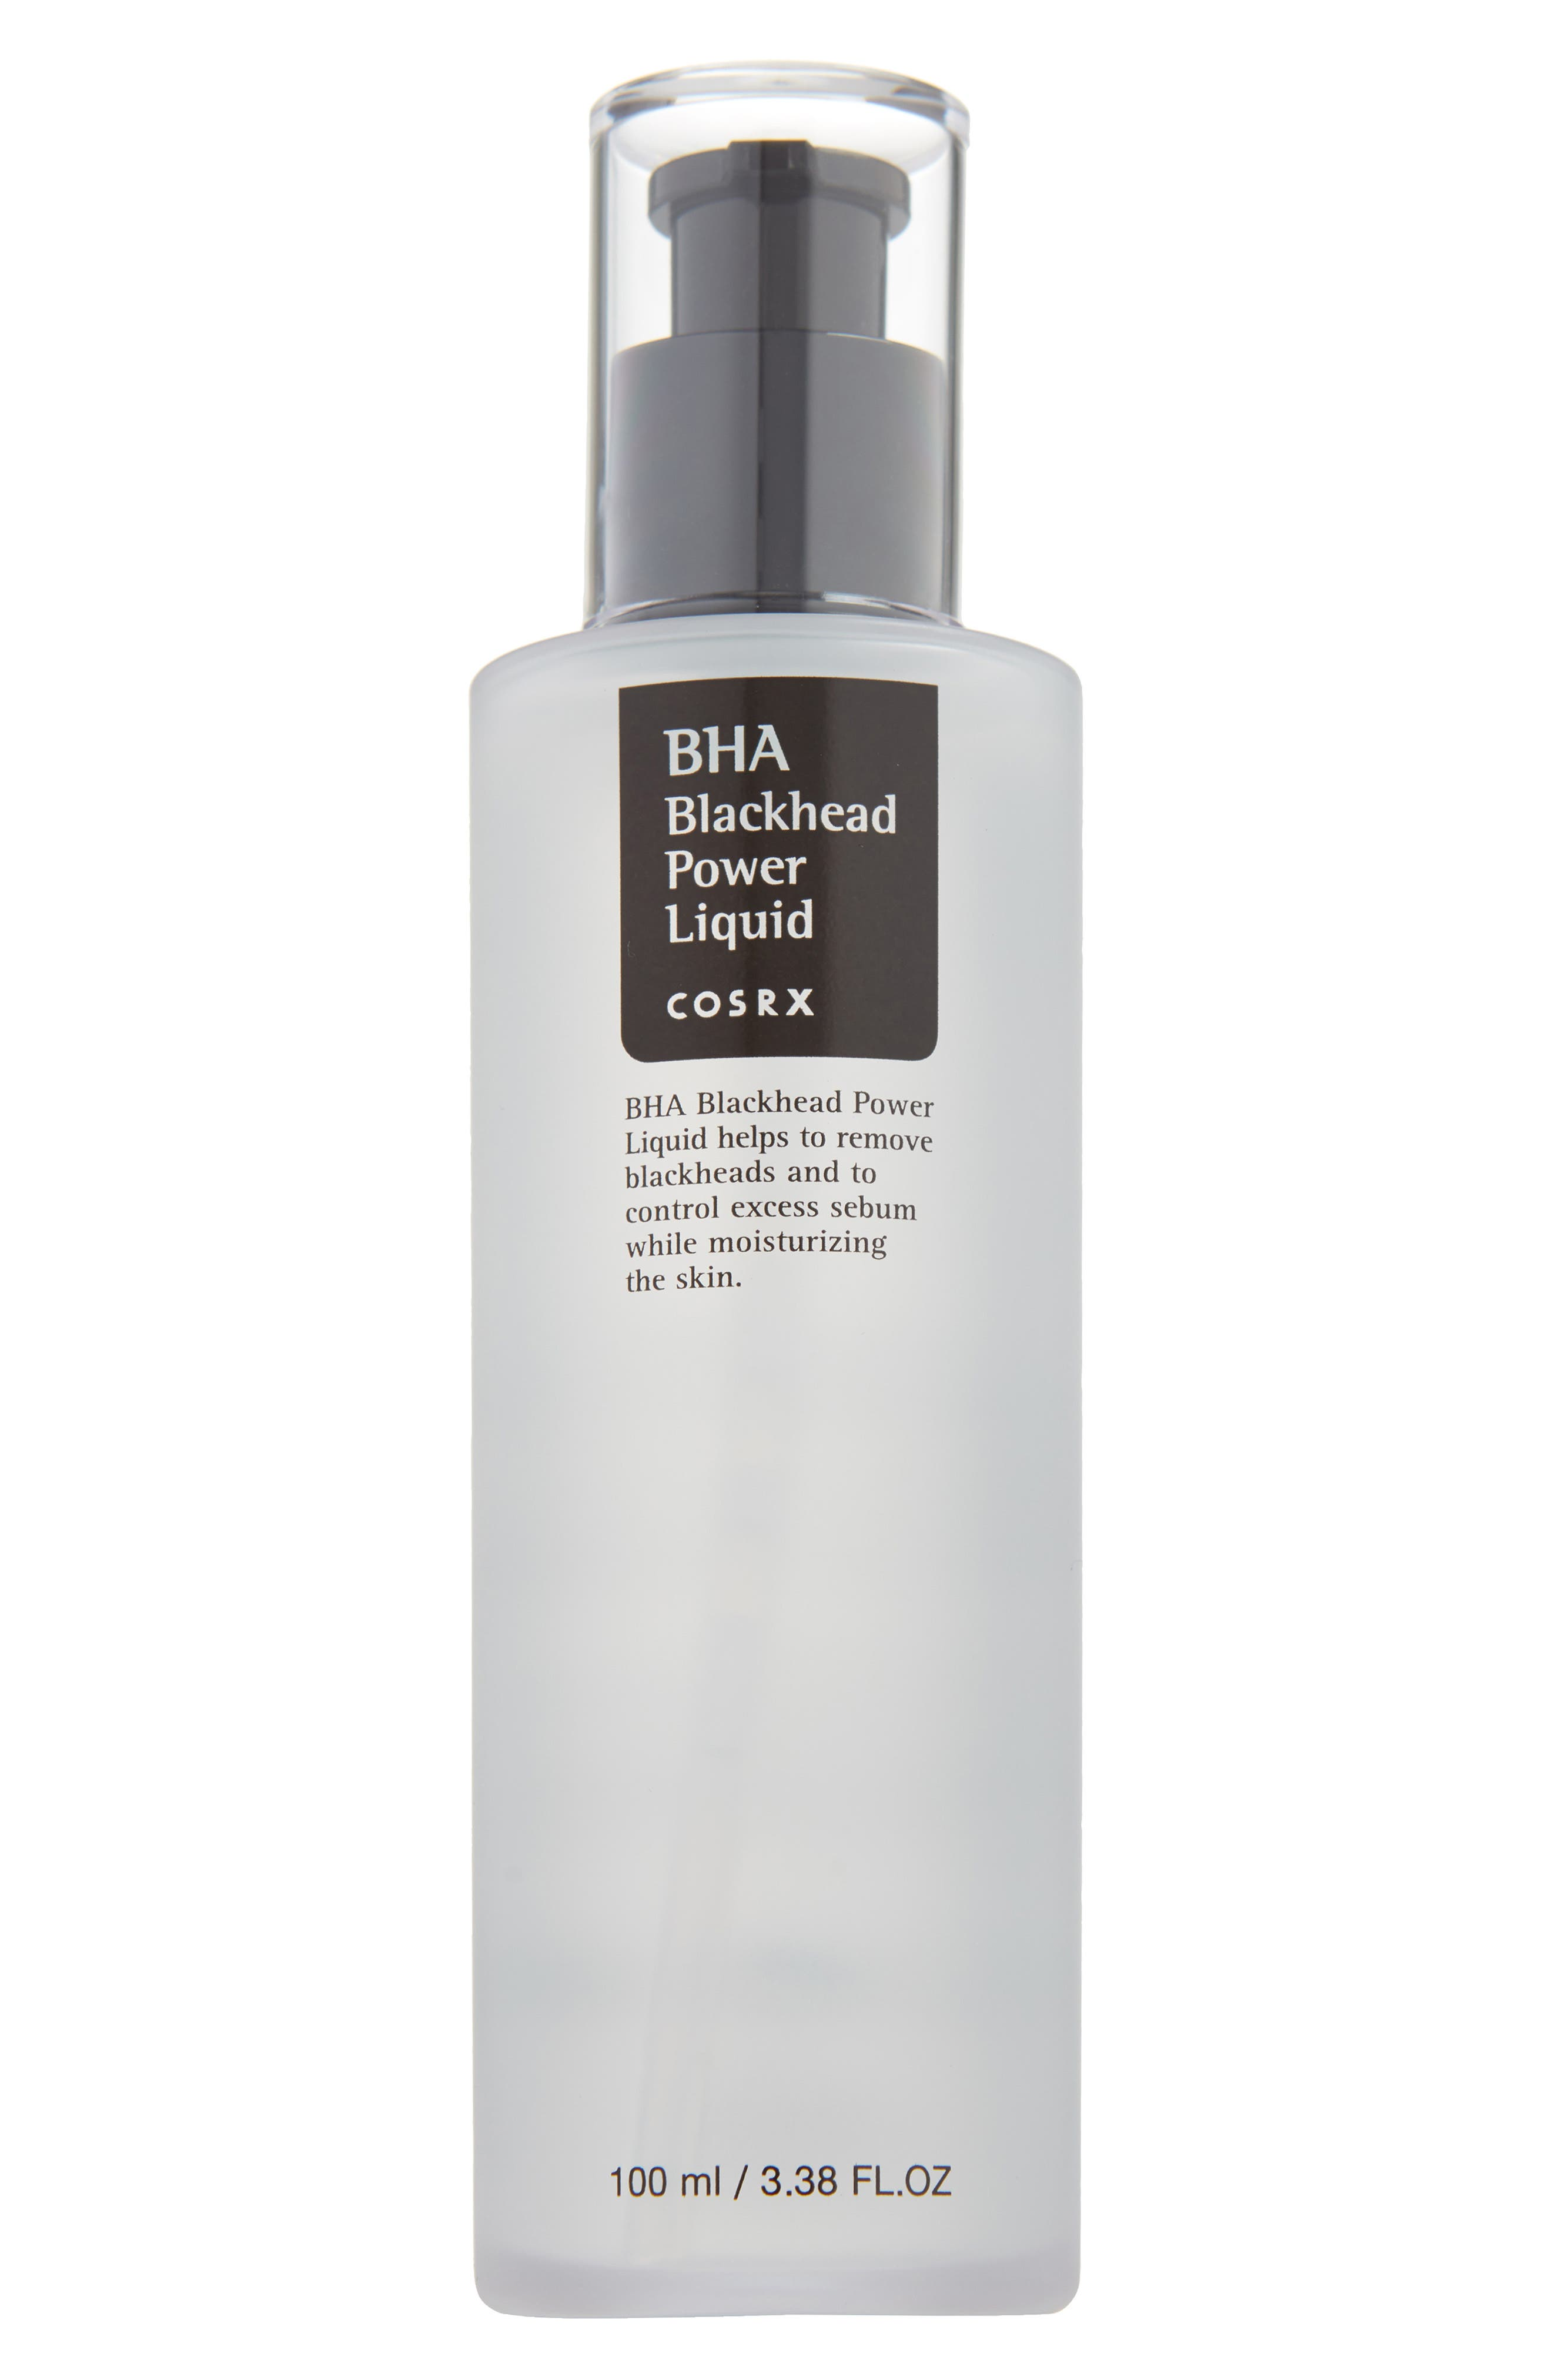 COSRX Bha Blackhead Power Liquid in Clear